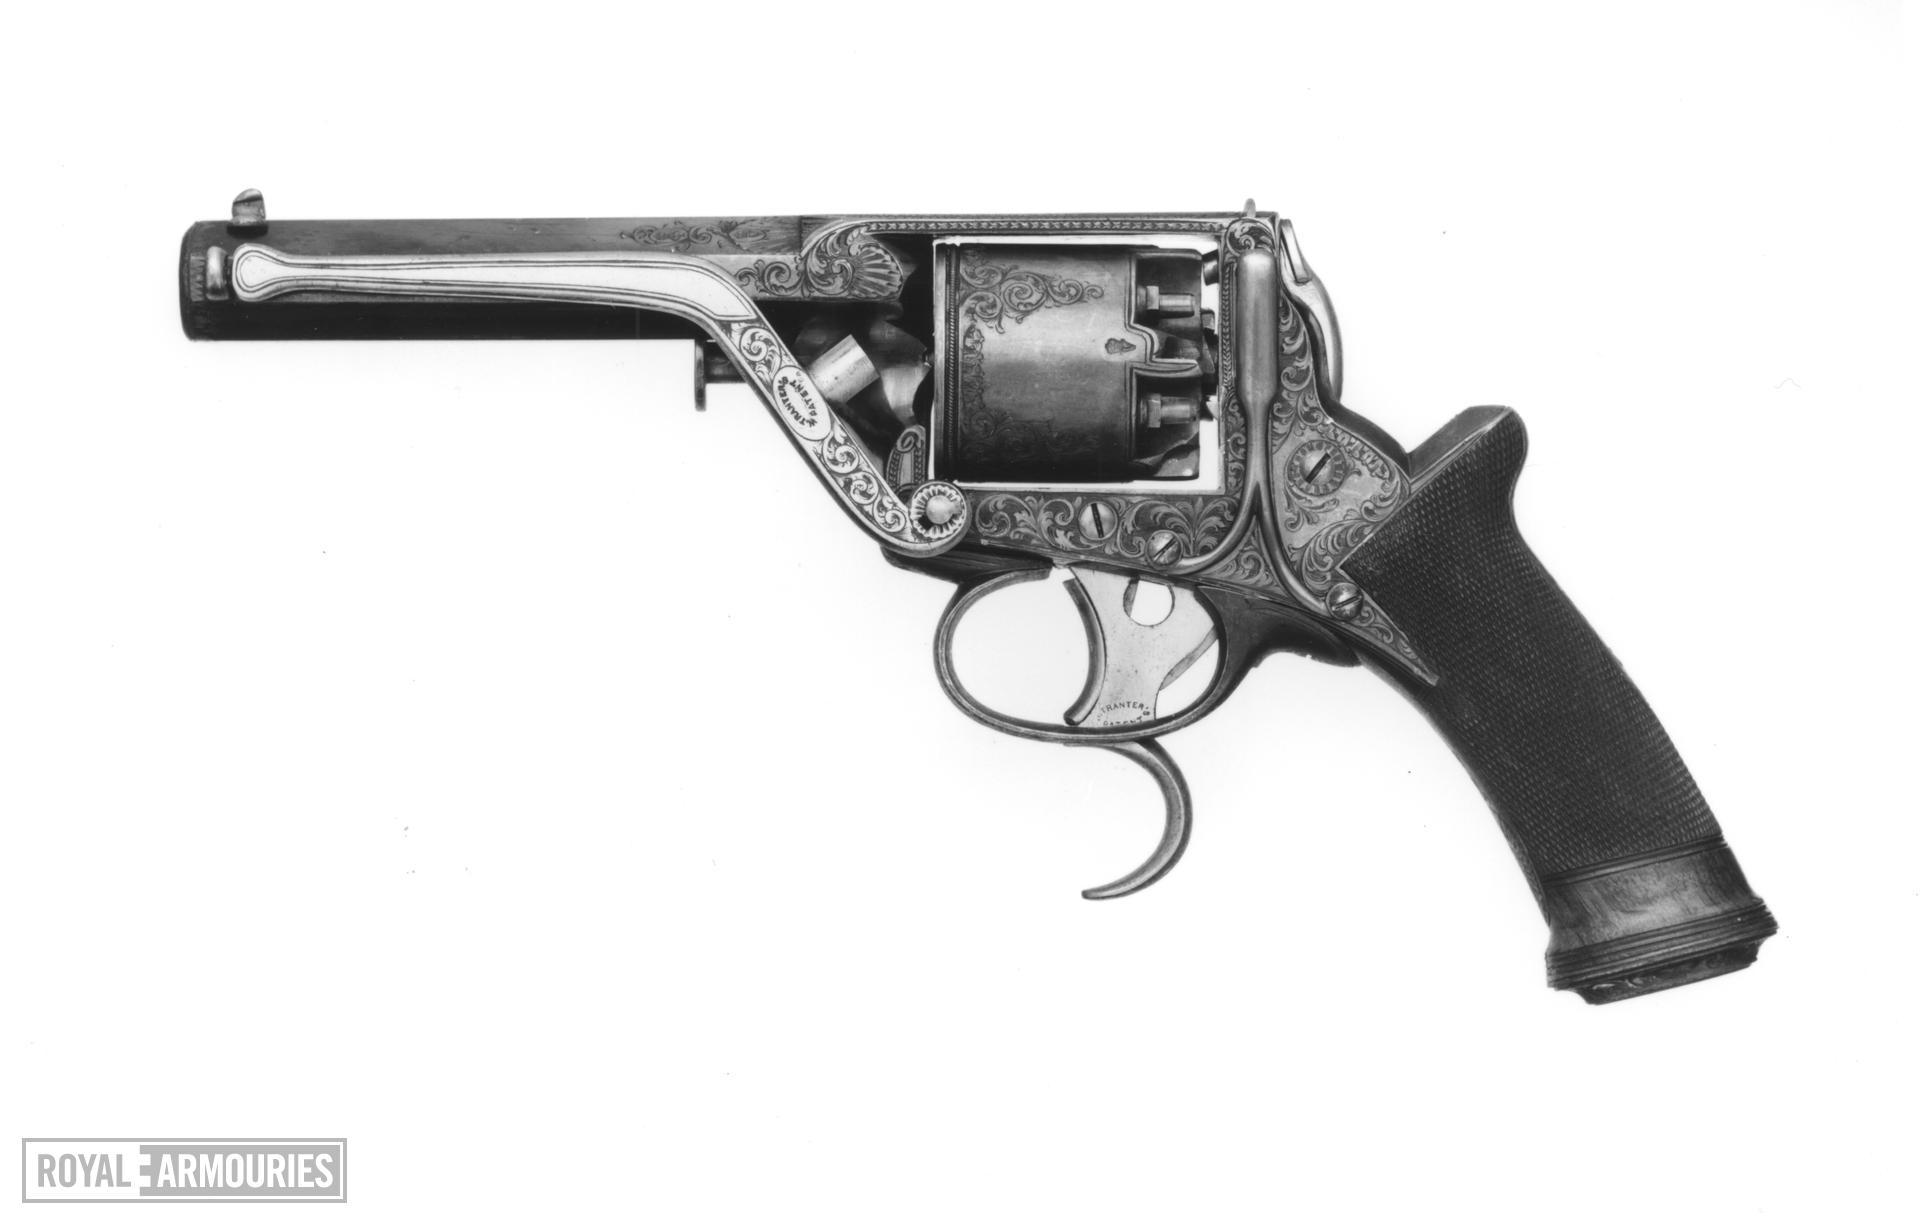 Percussion six-shot revolver - Tranter